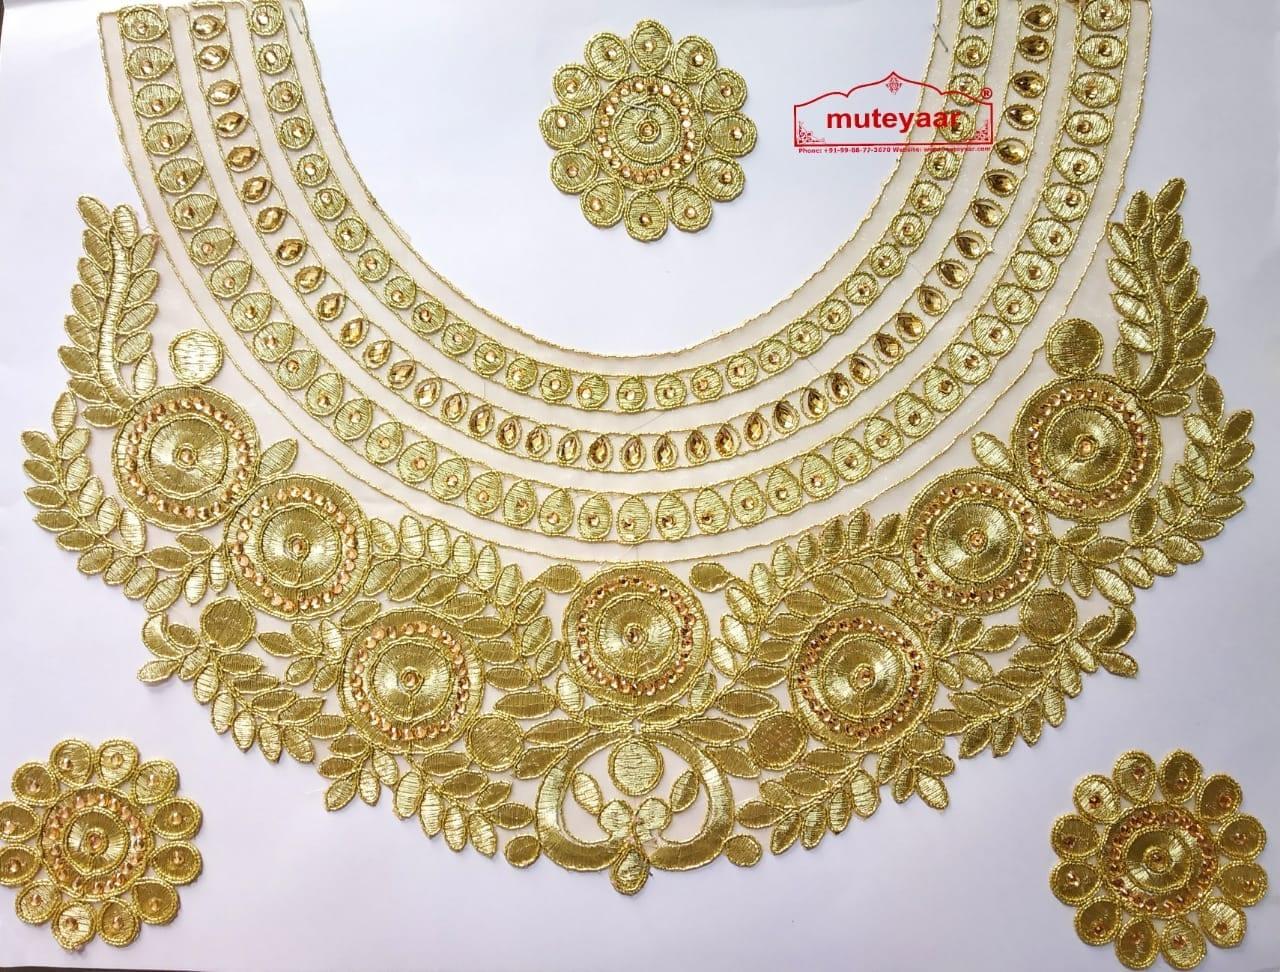 Golden Zari Round Heavy Neck Patch with Kundan Work for Kurti MT0030 1